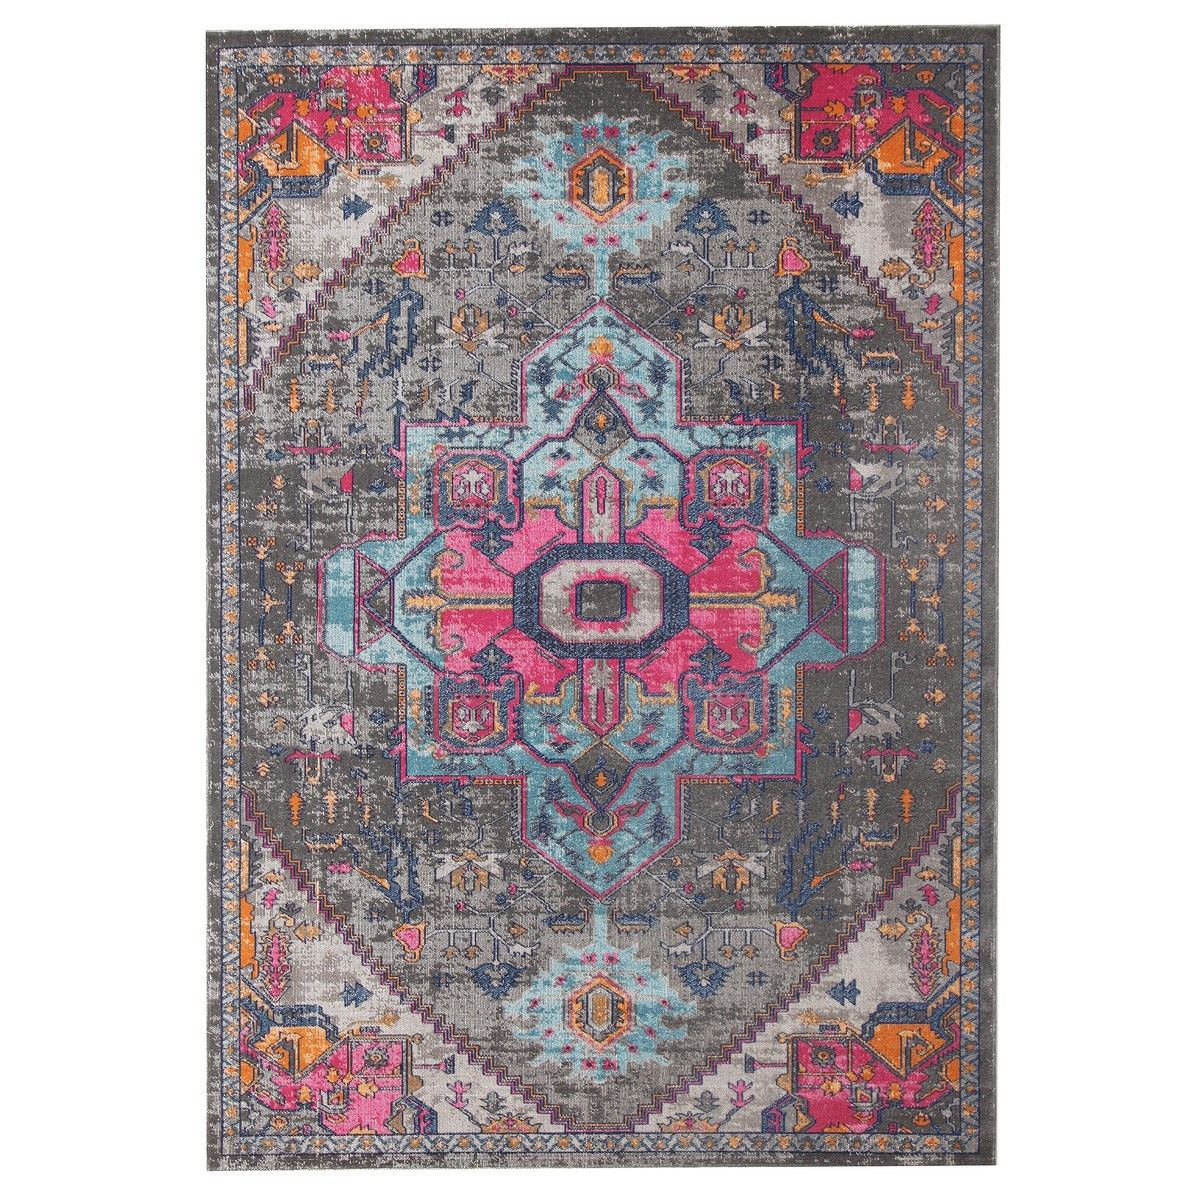 Eternal Whisper Quad Turkish Made Oriental Rug, 240x330cm, Grey